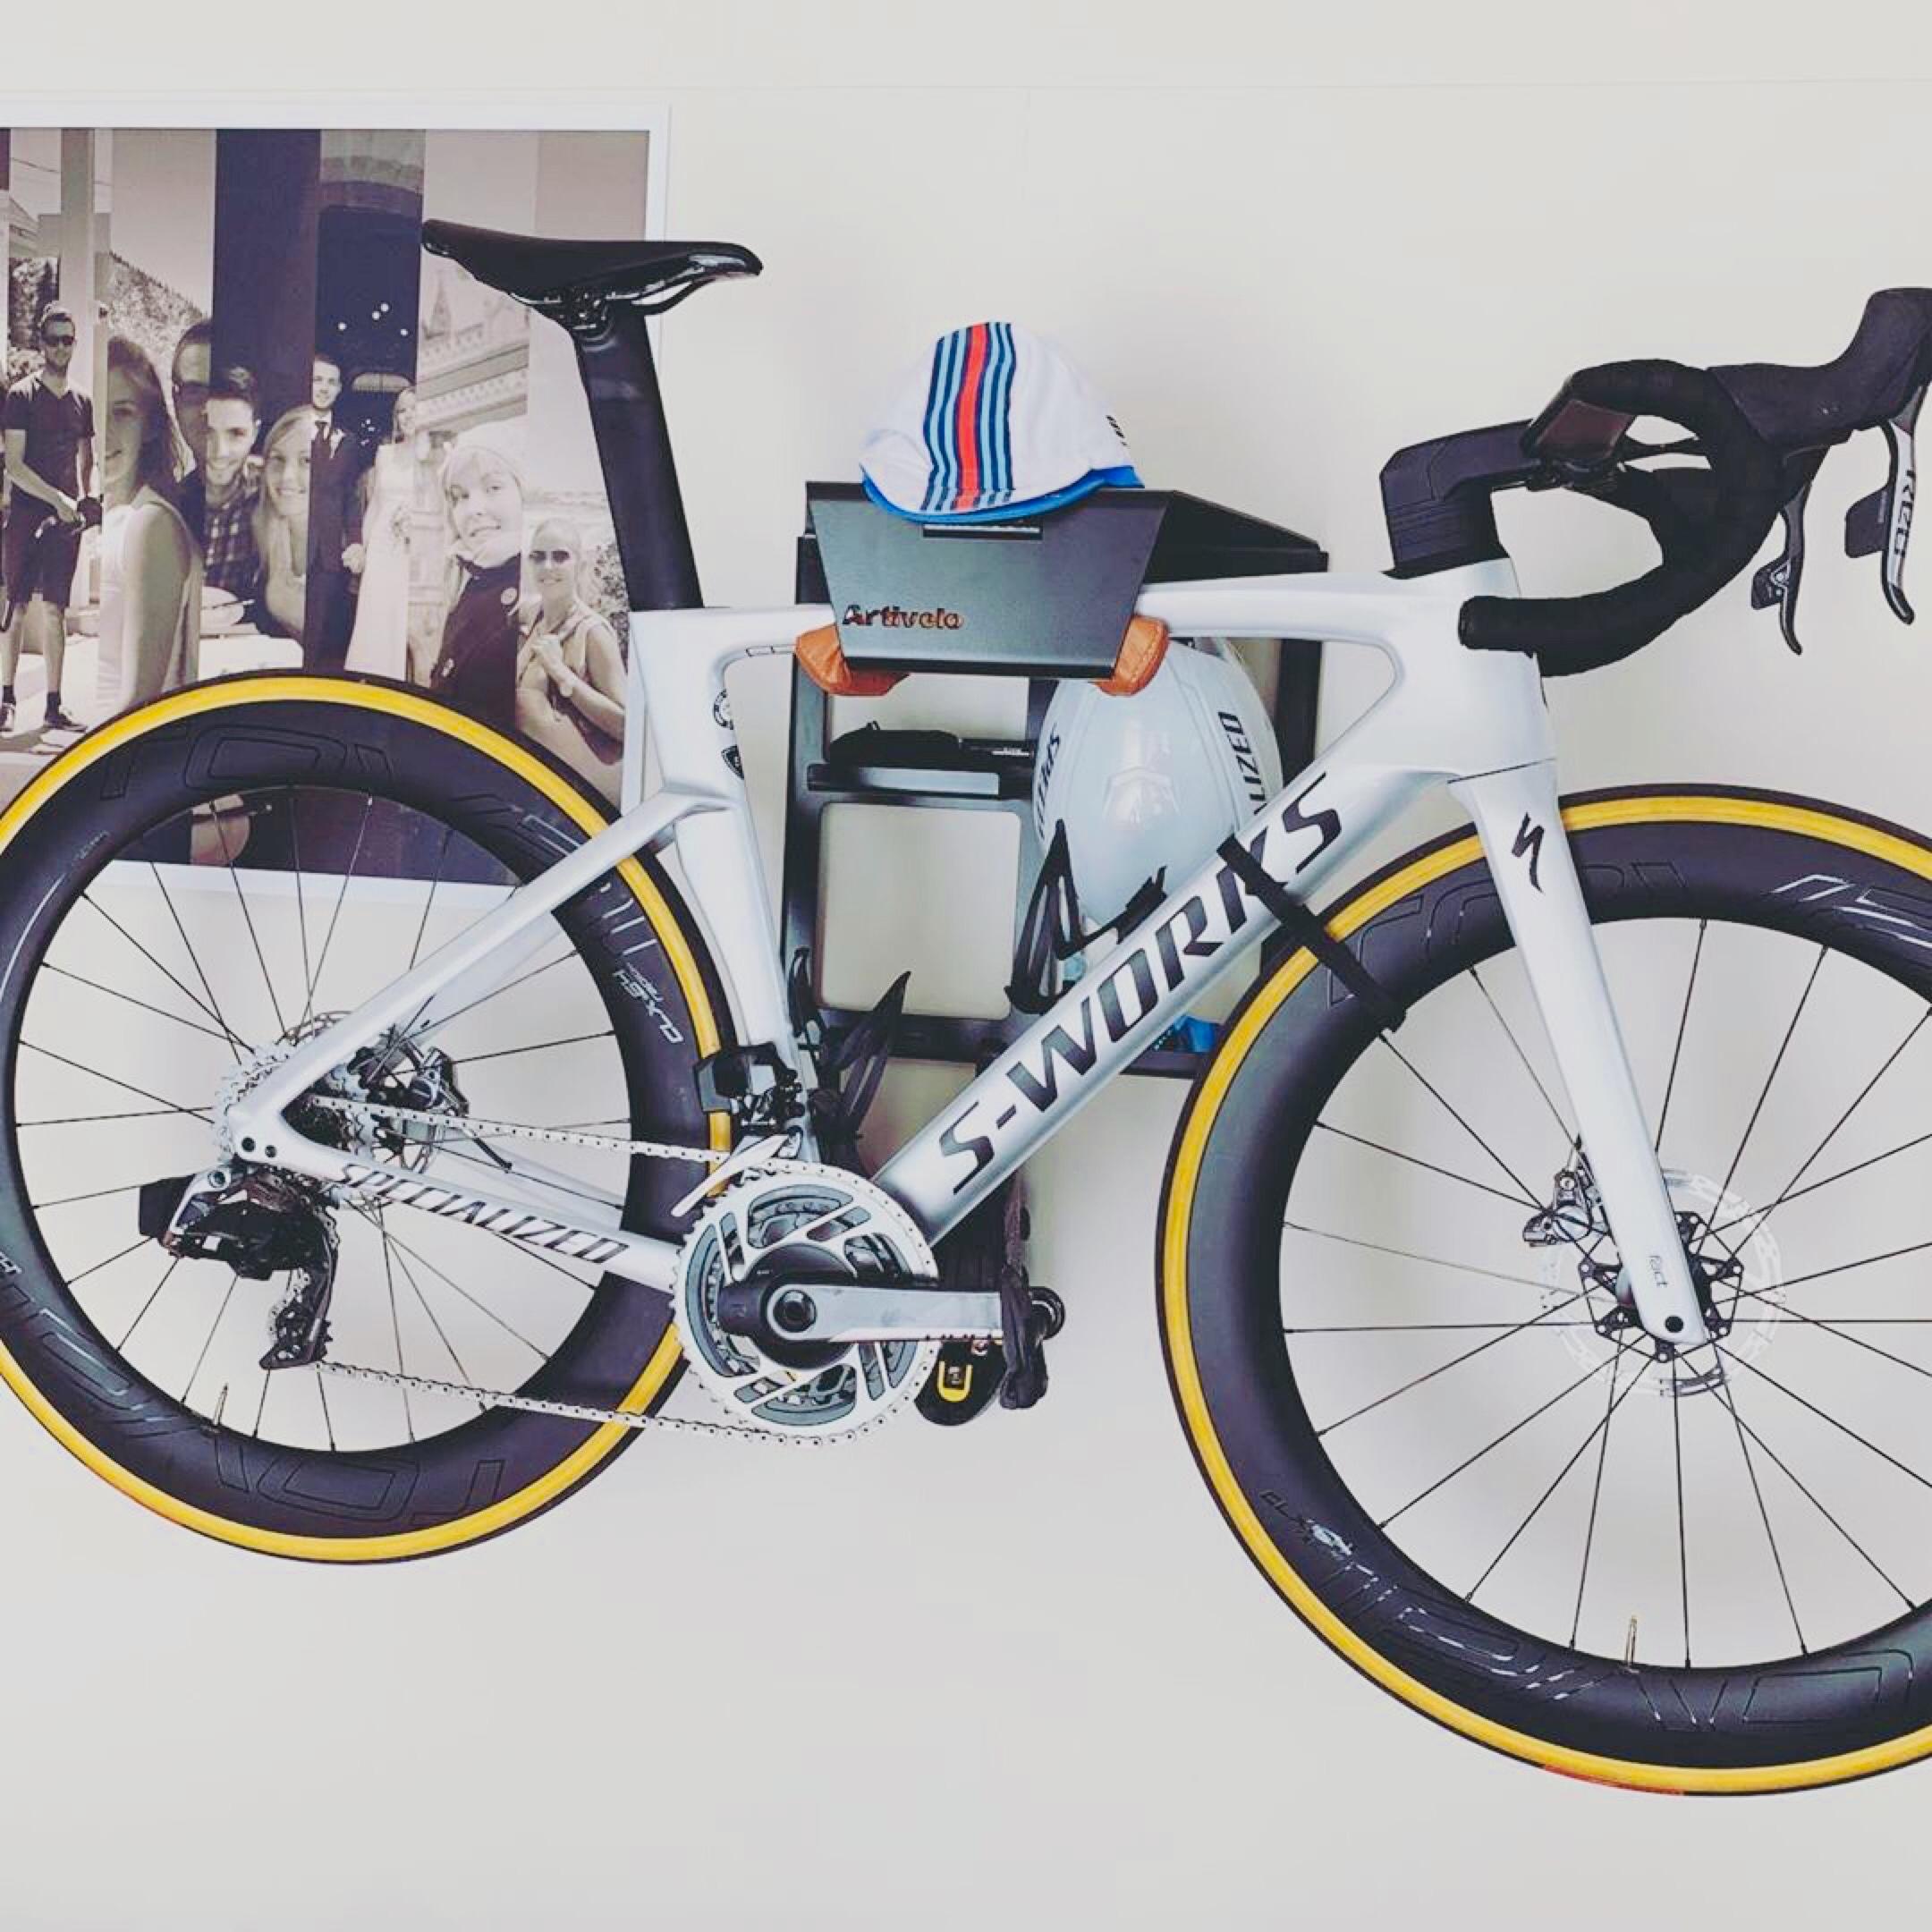 Bike storage on the wall